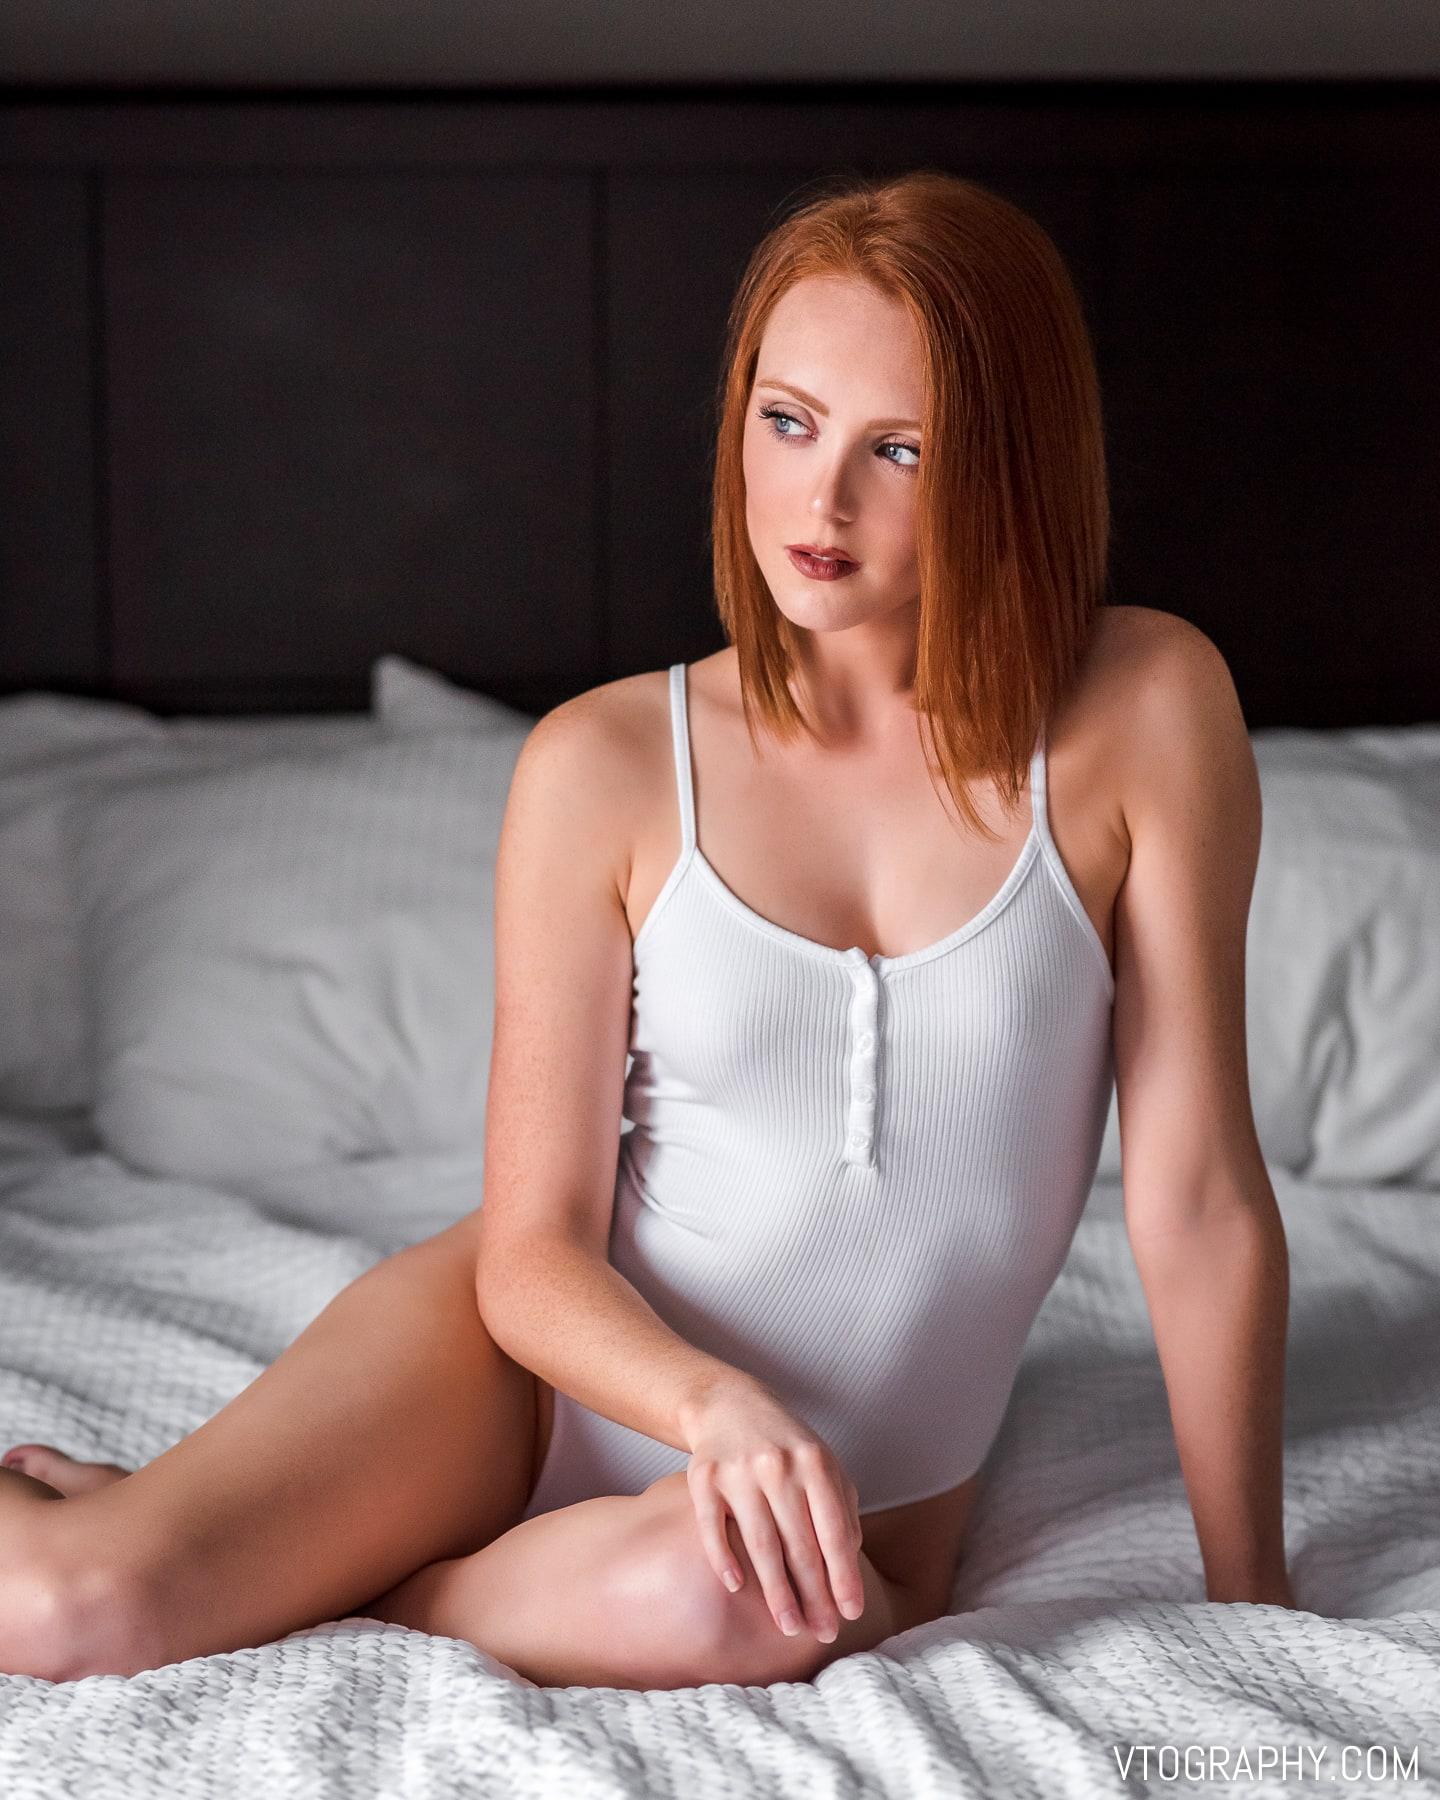 Red haired model Ashley in white bodysuit